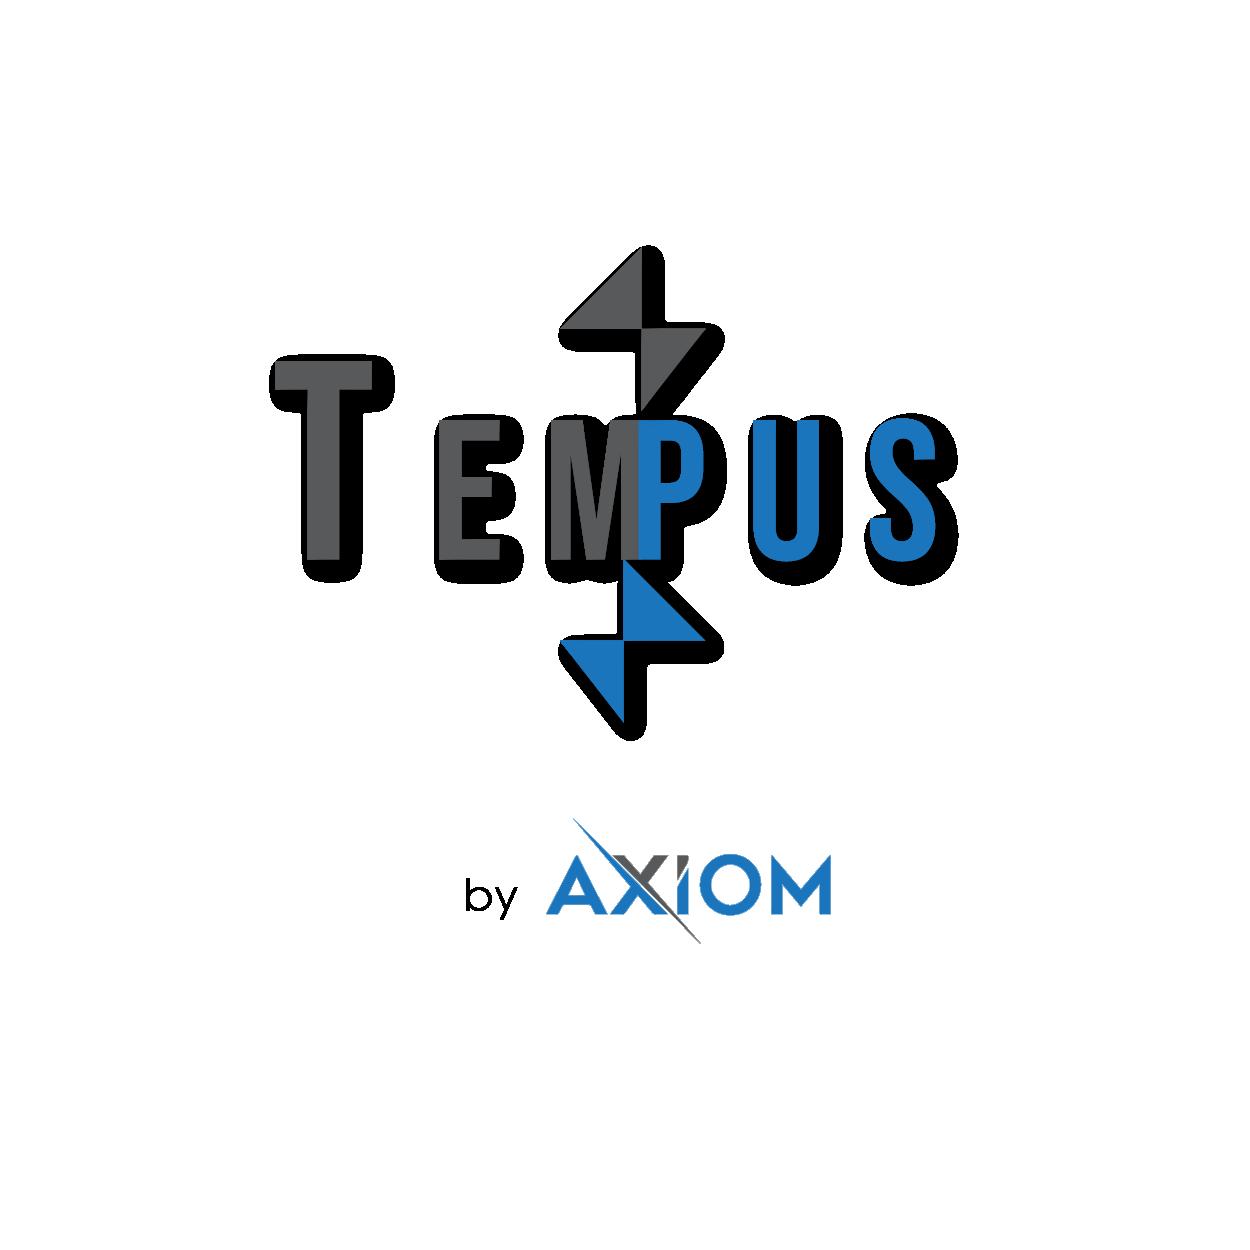 Tempus 3.png